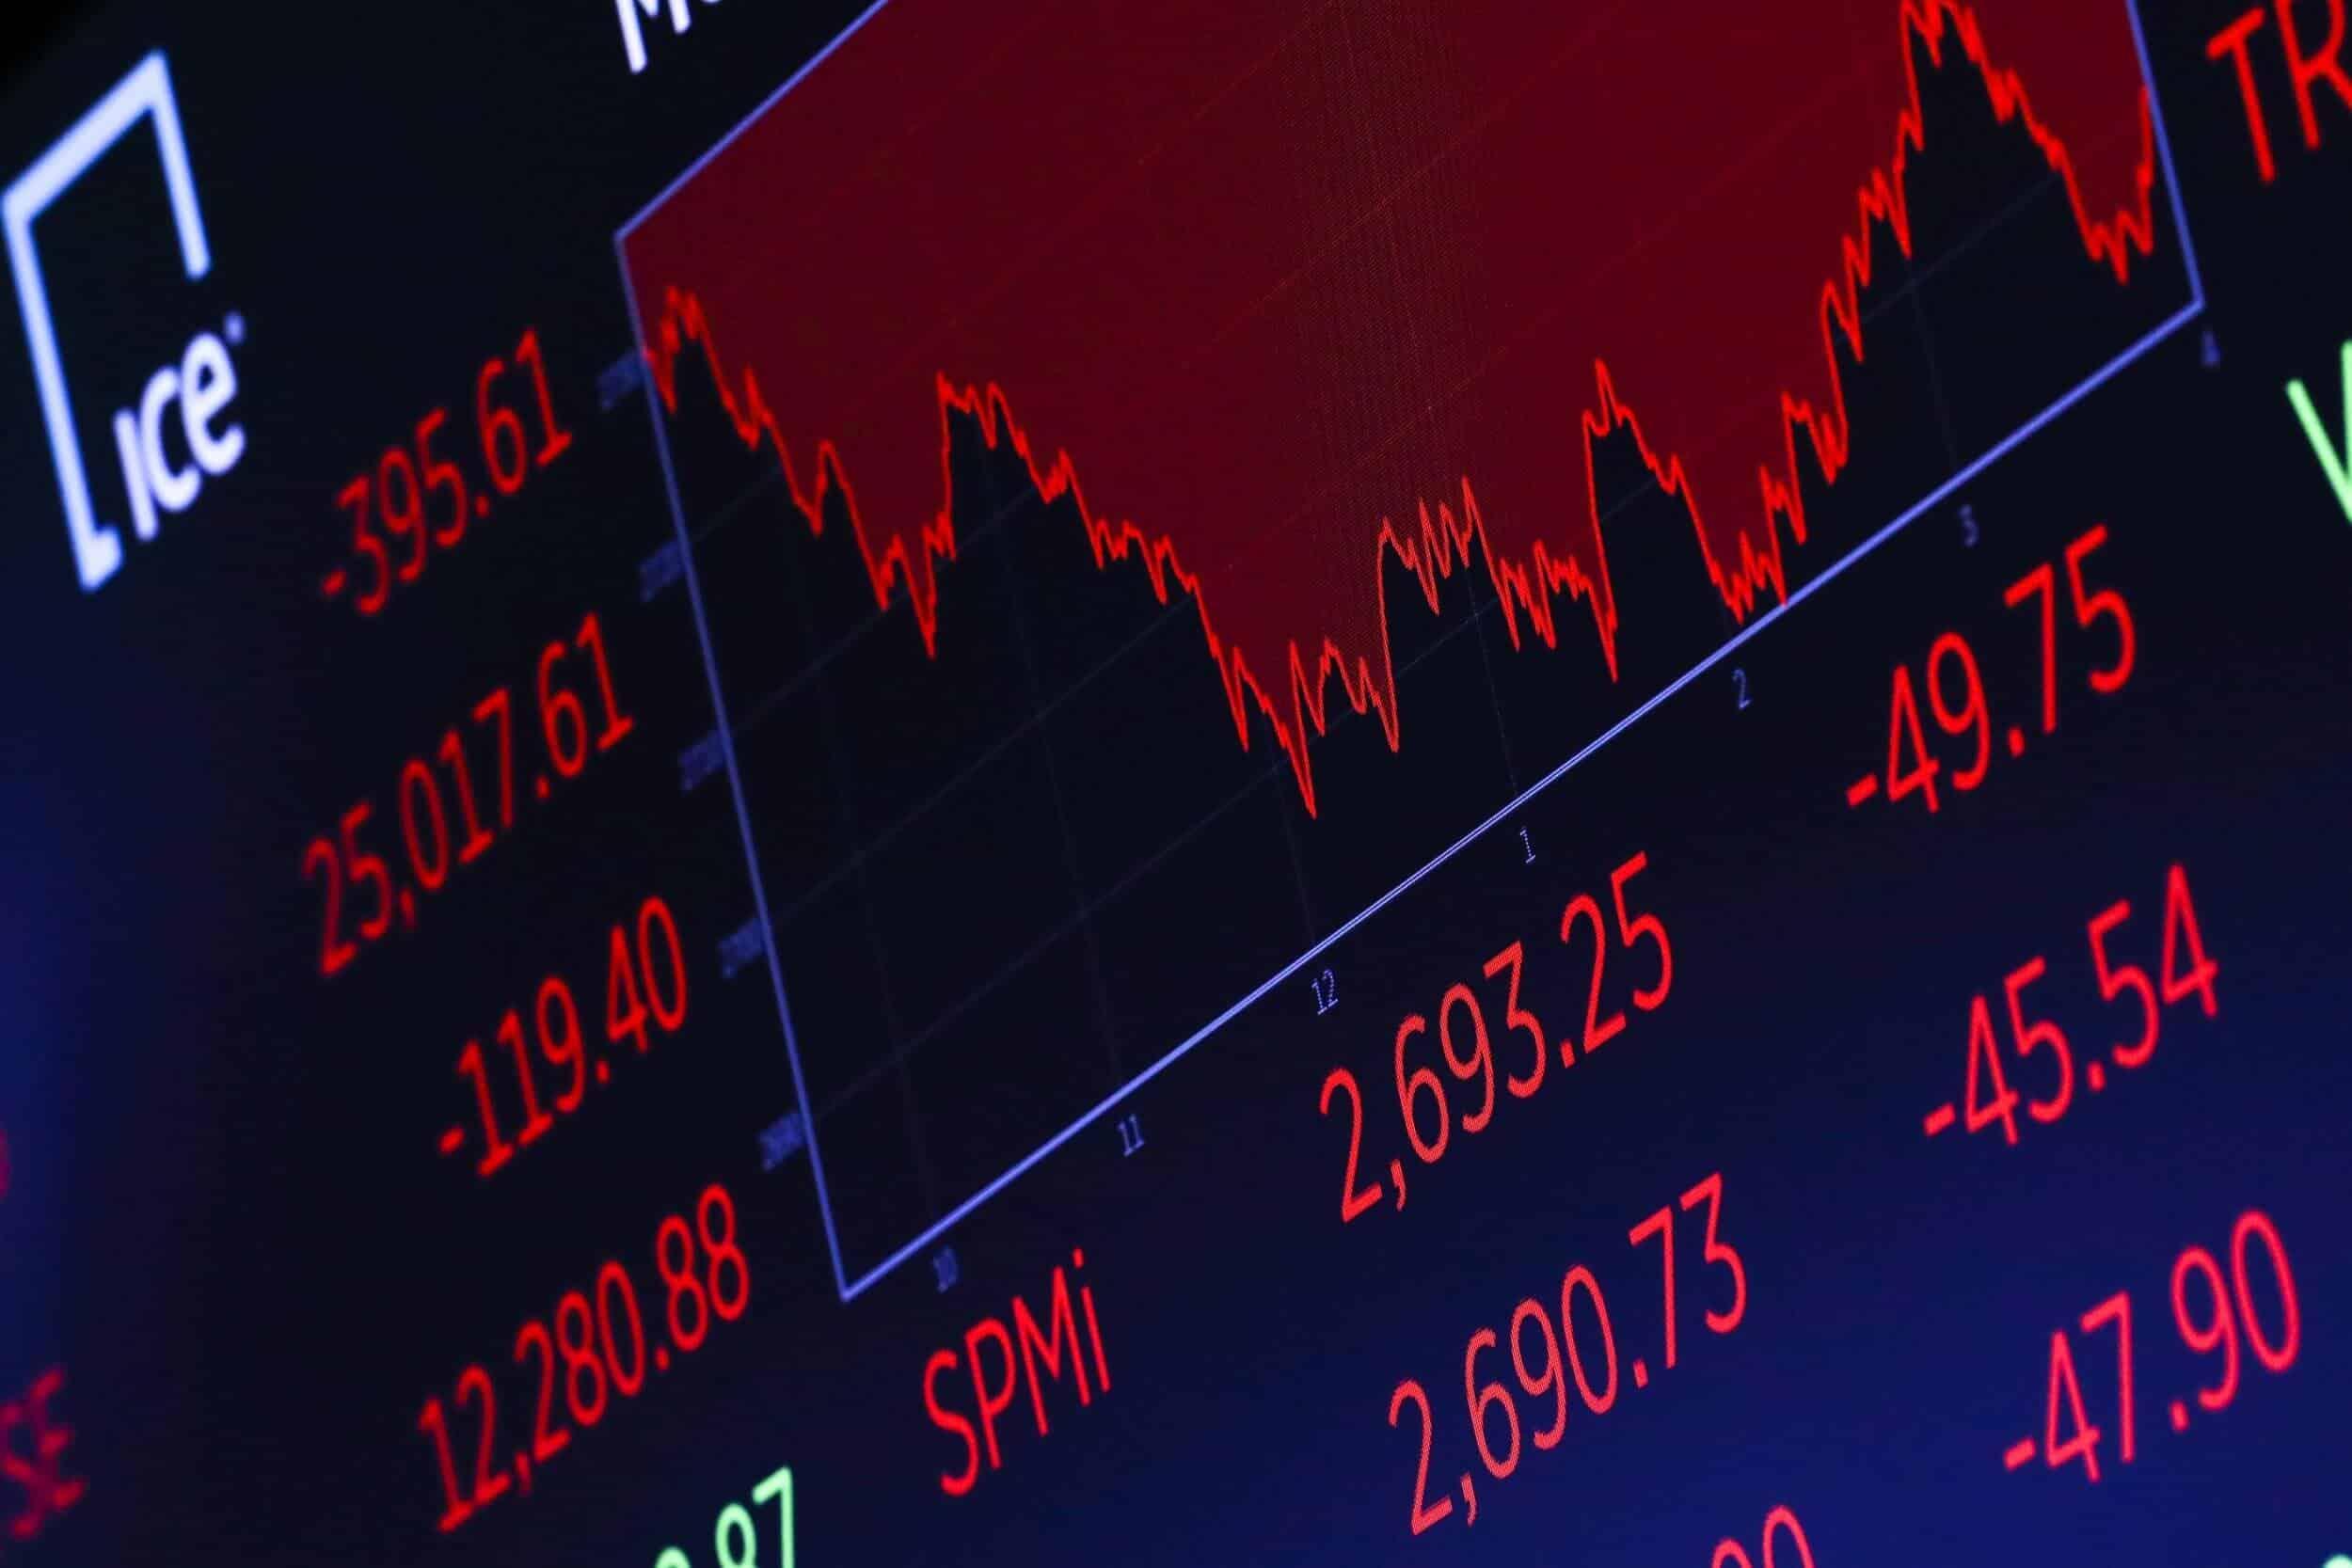 UK Economic Growth Tumbles